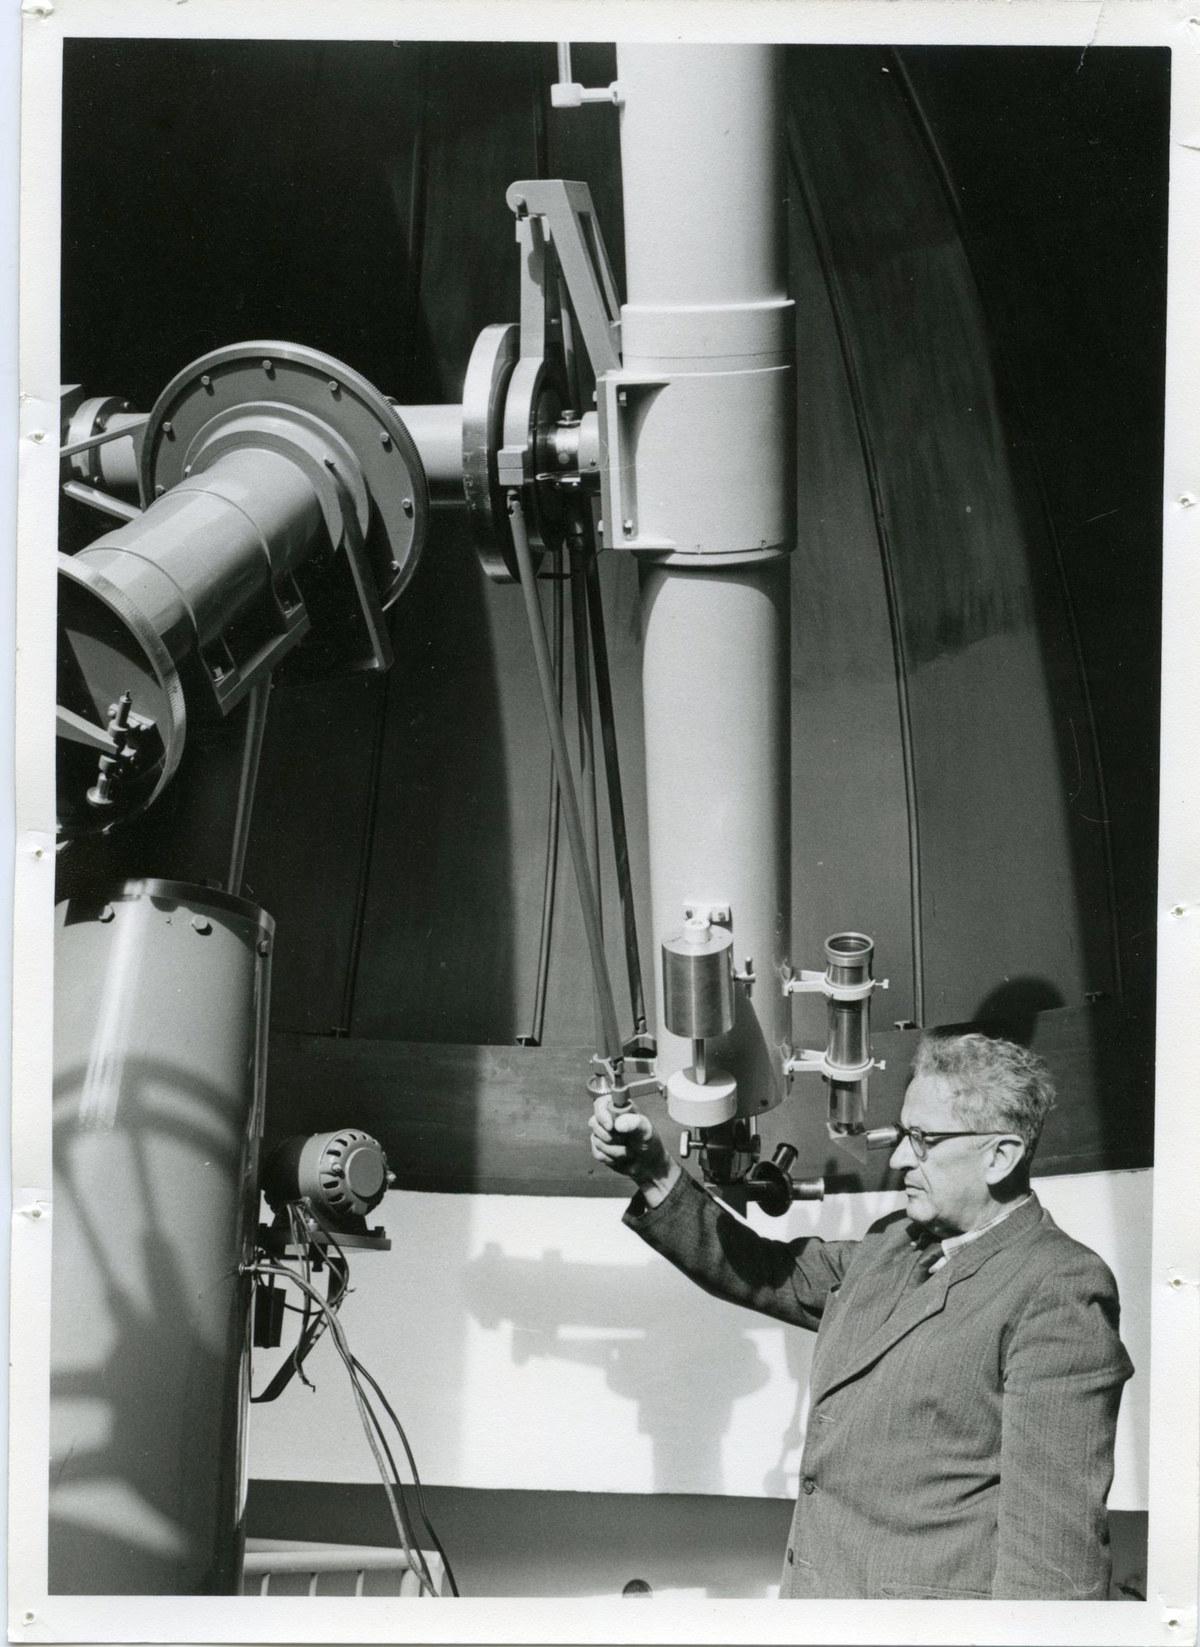 Gajdusek-Kozelsky 20cm refractor